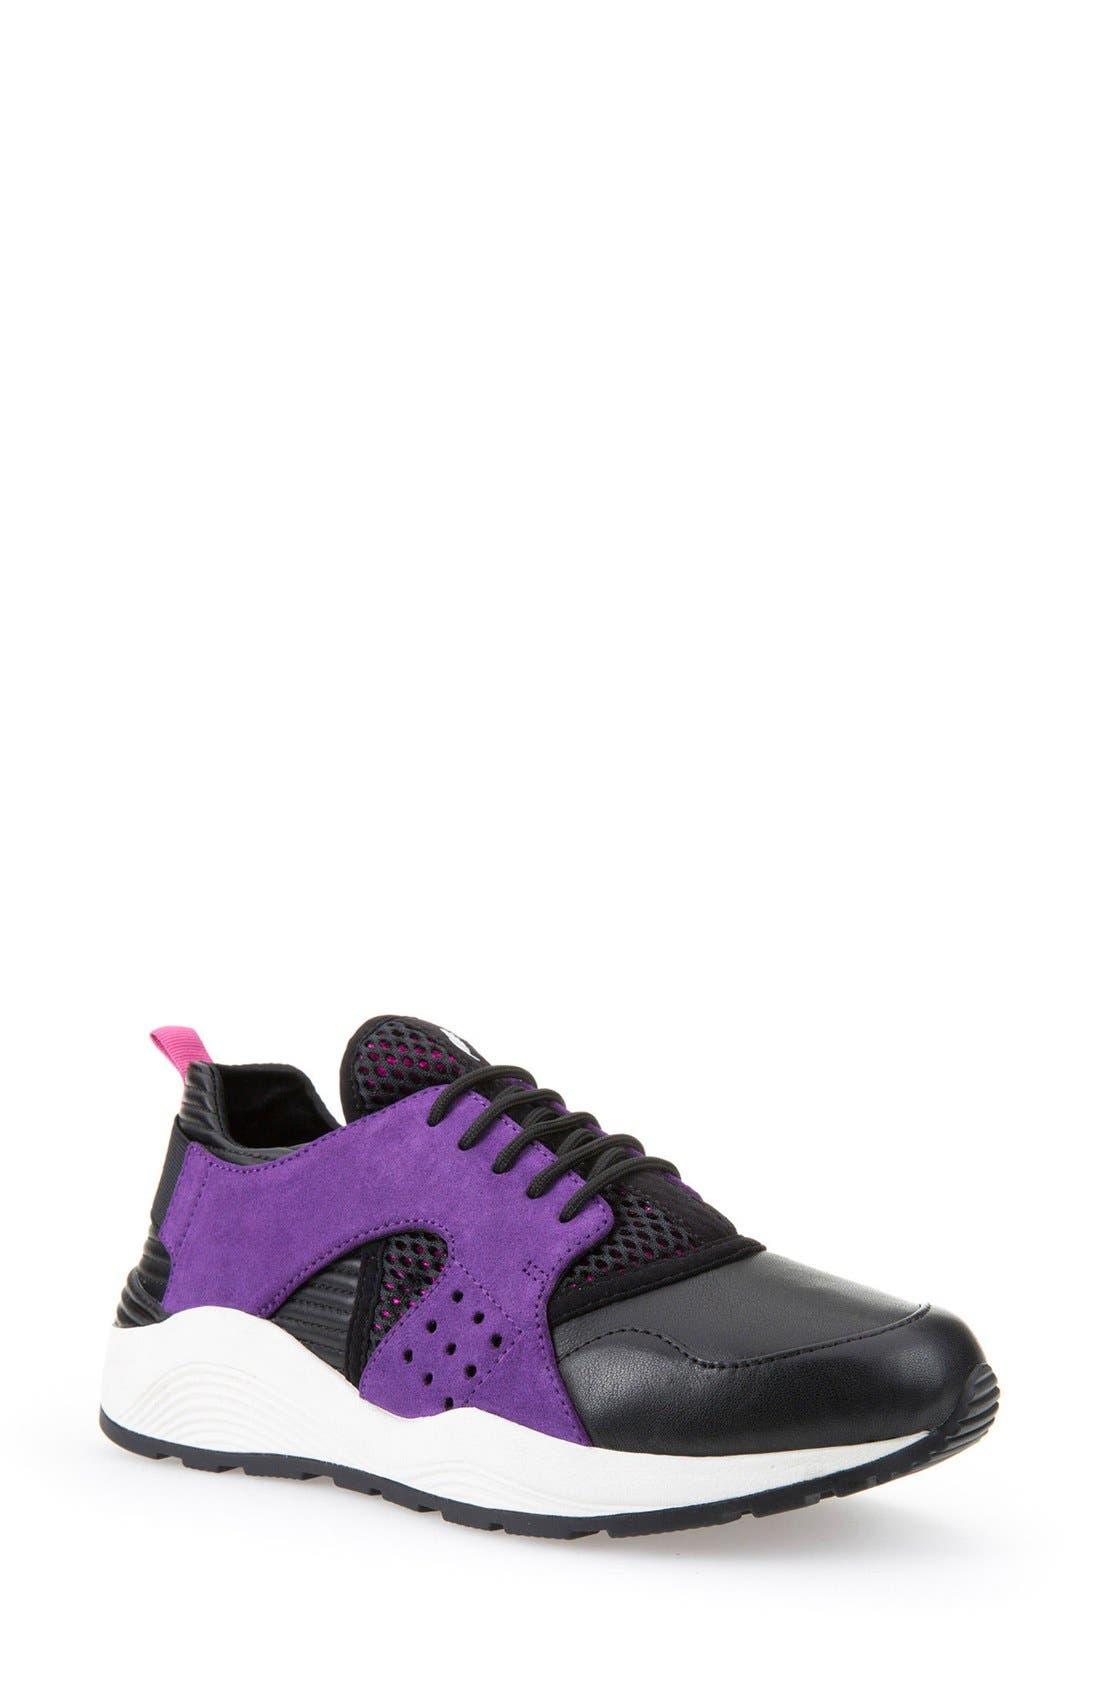 Main Image - Geox 'Omaya' Sneaker (Women)